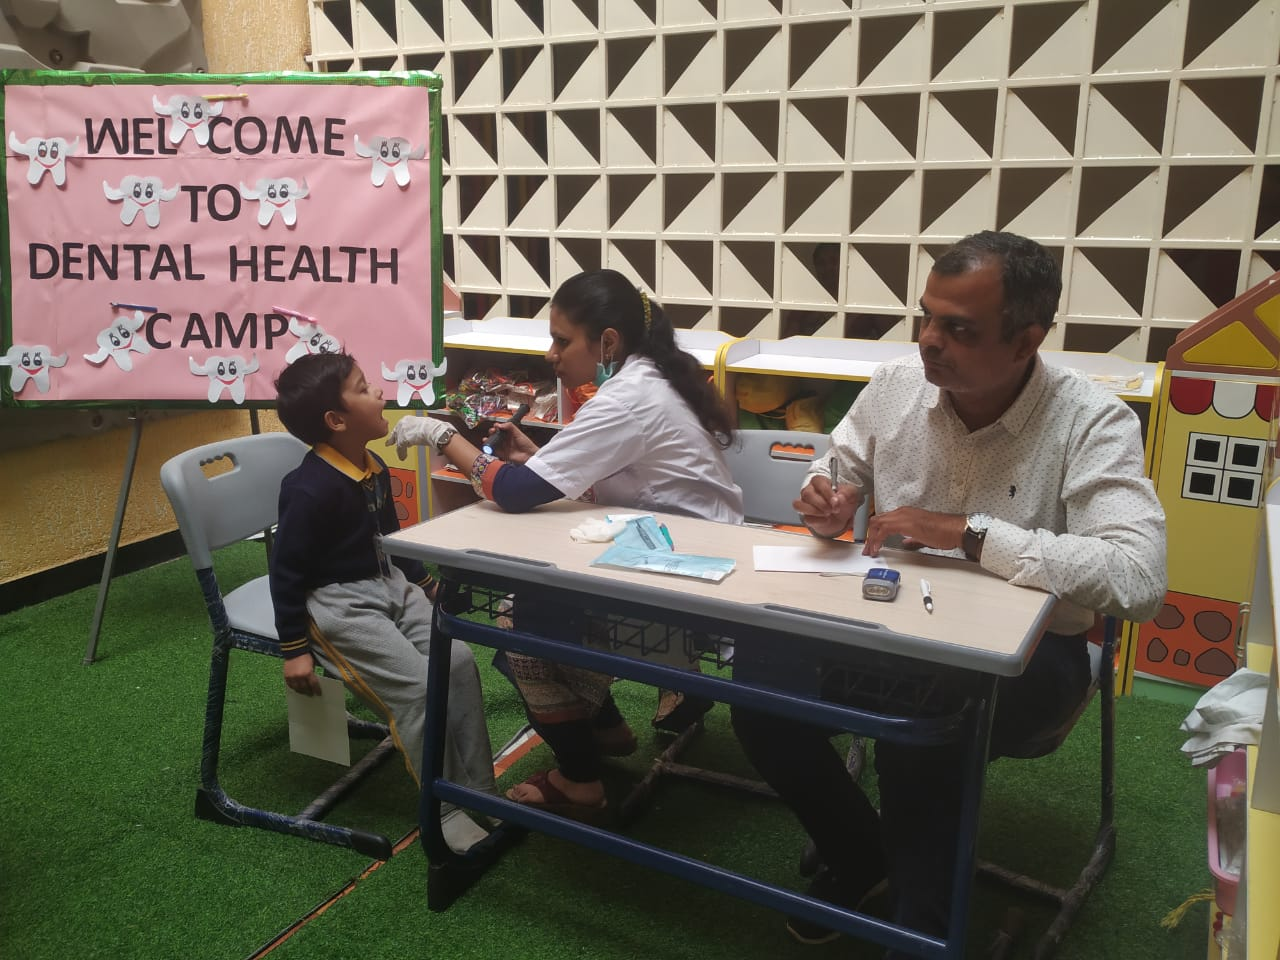 school-activity-dental-health-camp-vijaya-convent-school-amravati